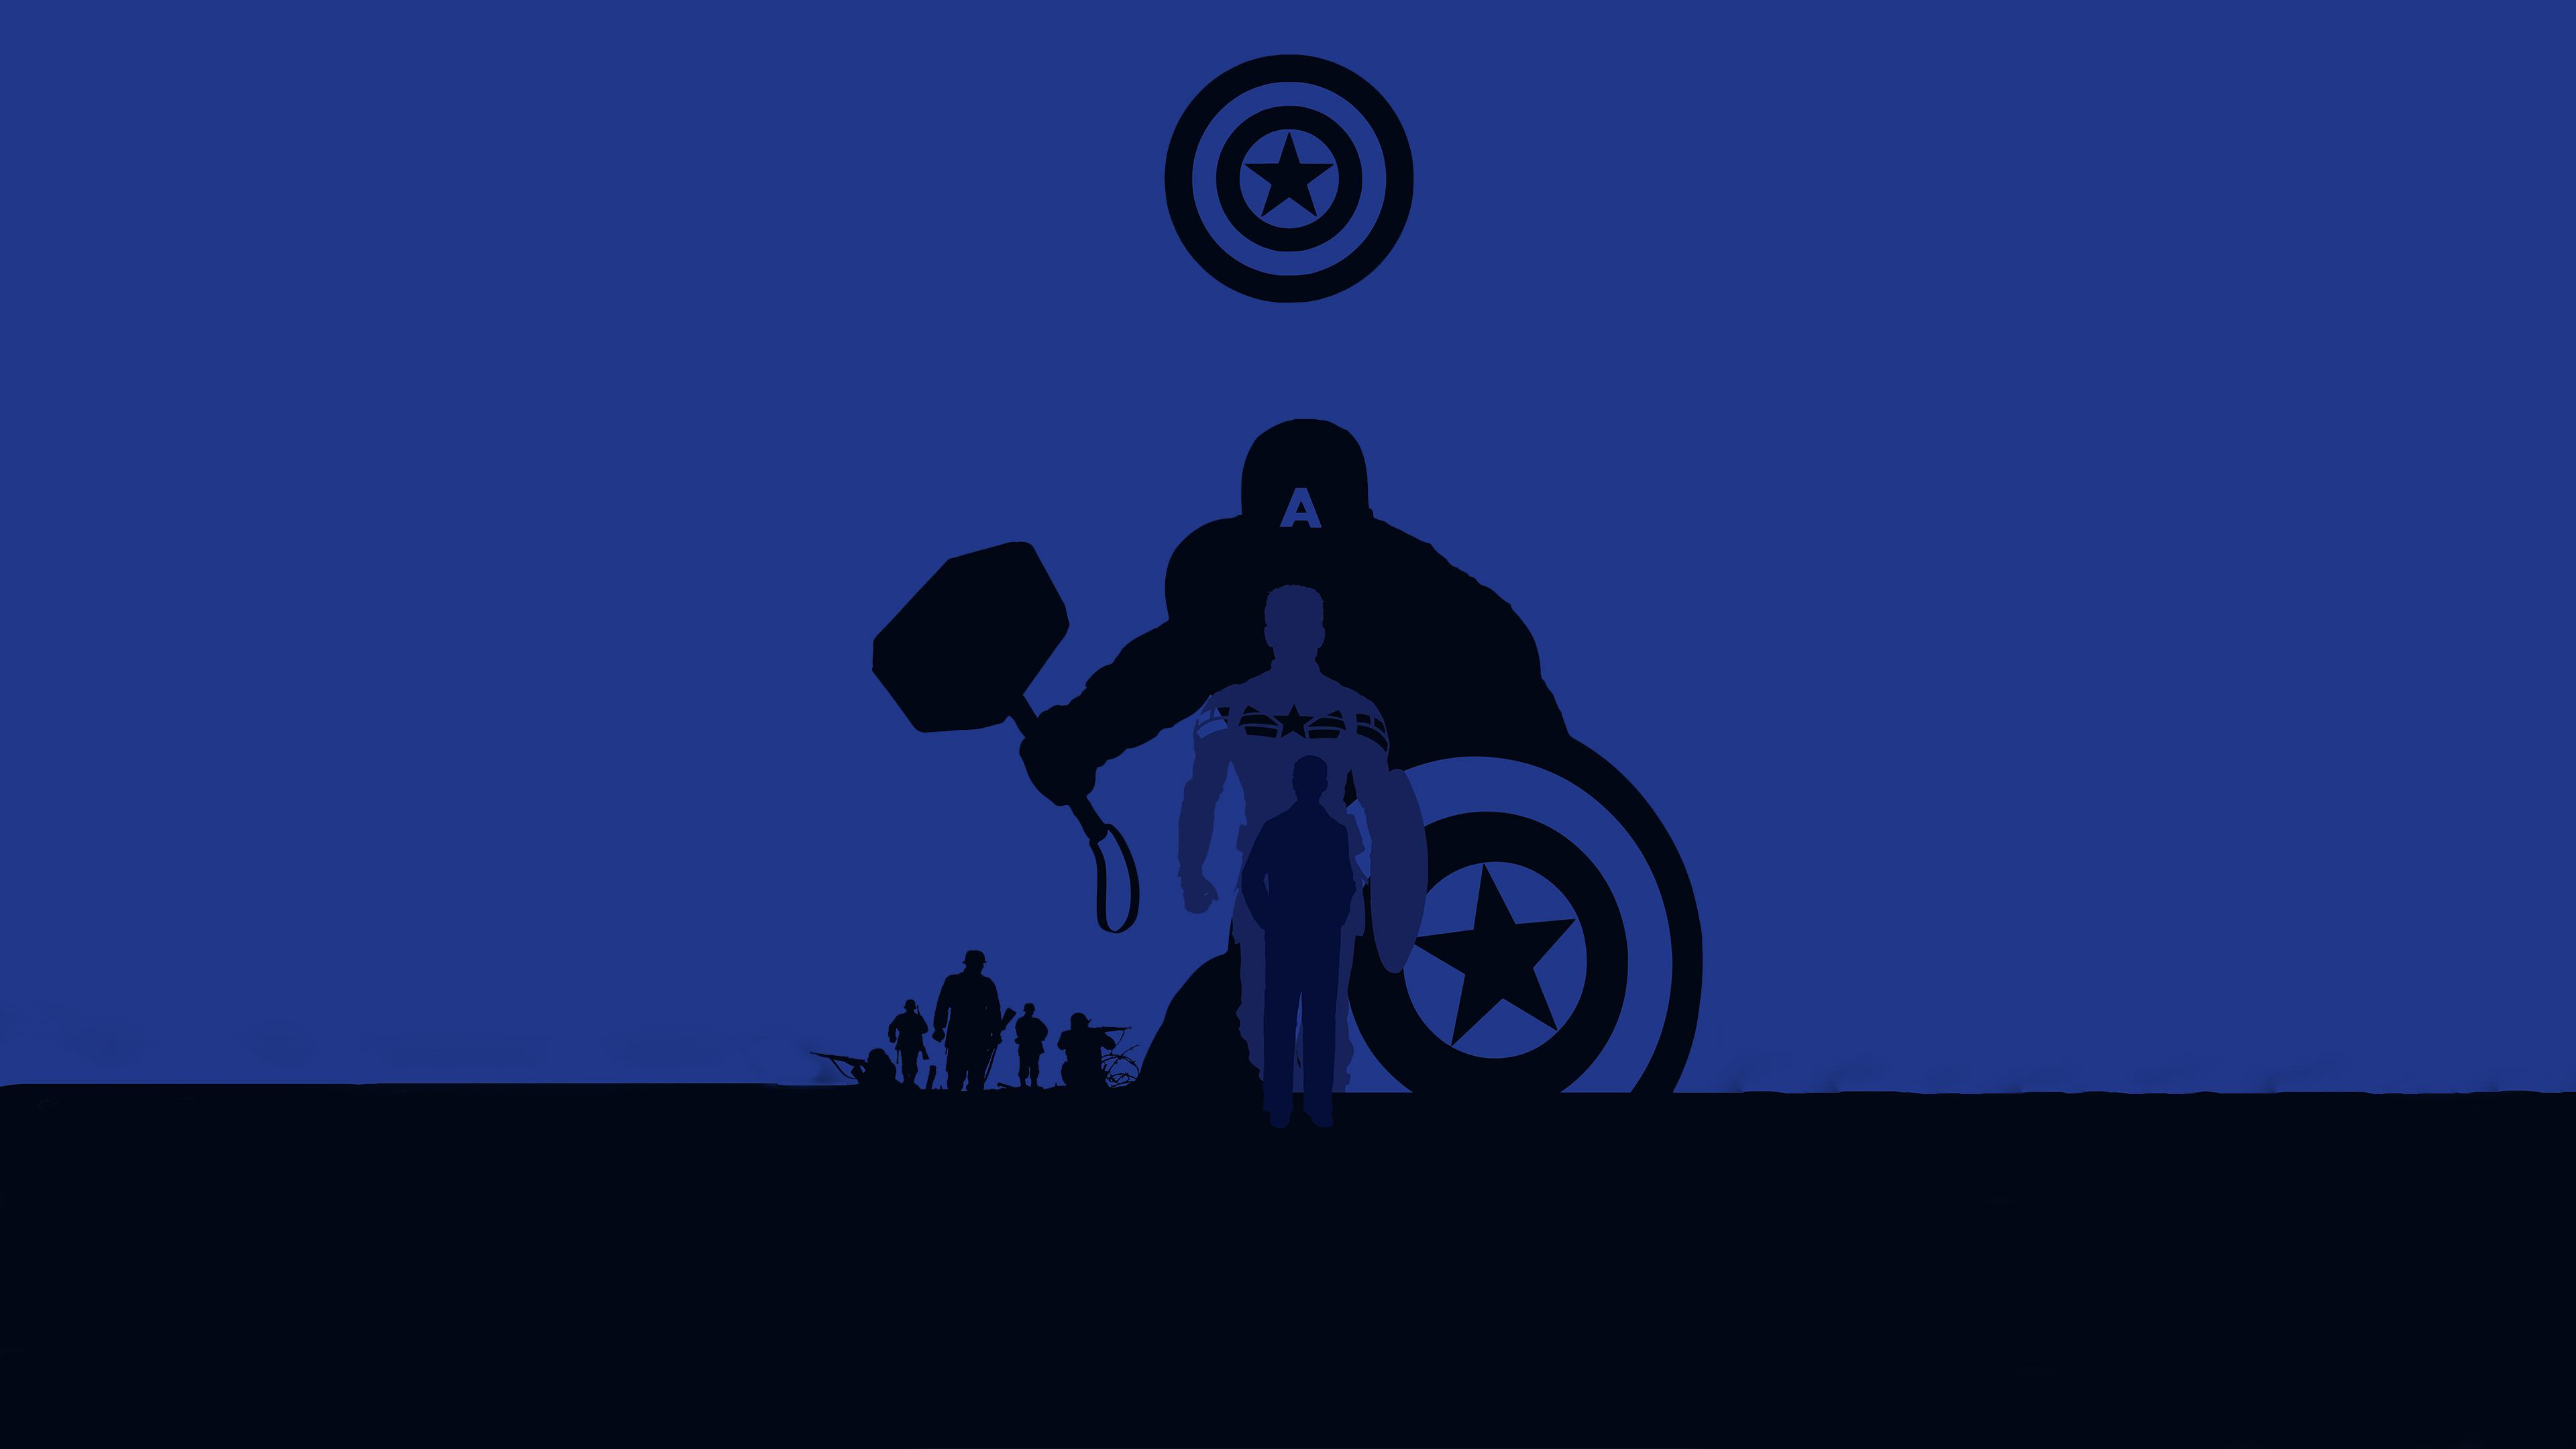 captain america avengers endgame 4k minimalism 1560533658 - Captain America Avengers Endgame 4k Minimalism - superheroes wallpapers, hd-wallpapers, captain america wallpapers, behance wallpapers, avengers endgame wallpapers, artwork wallpapers, 4k-wallpapers